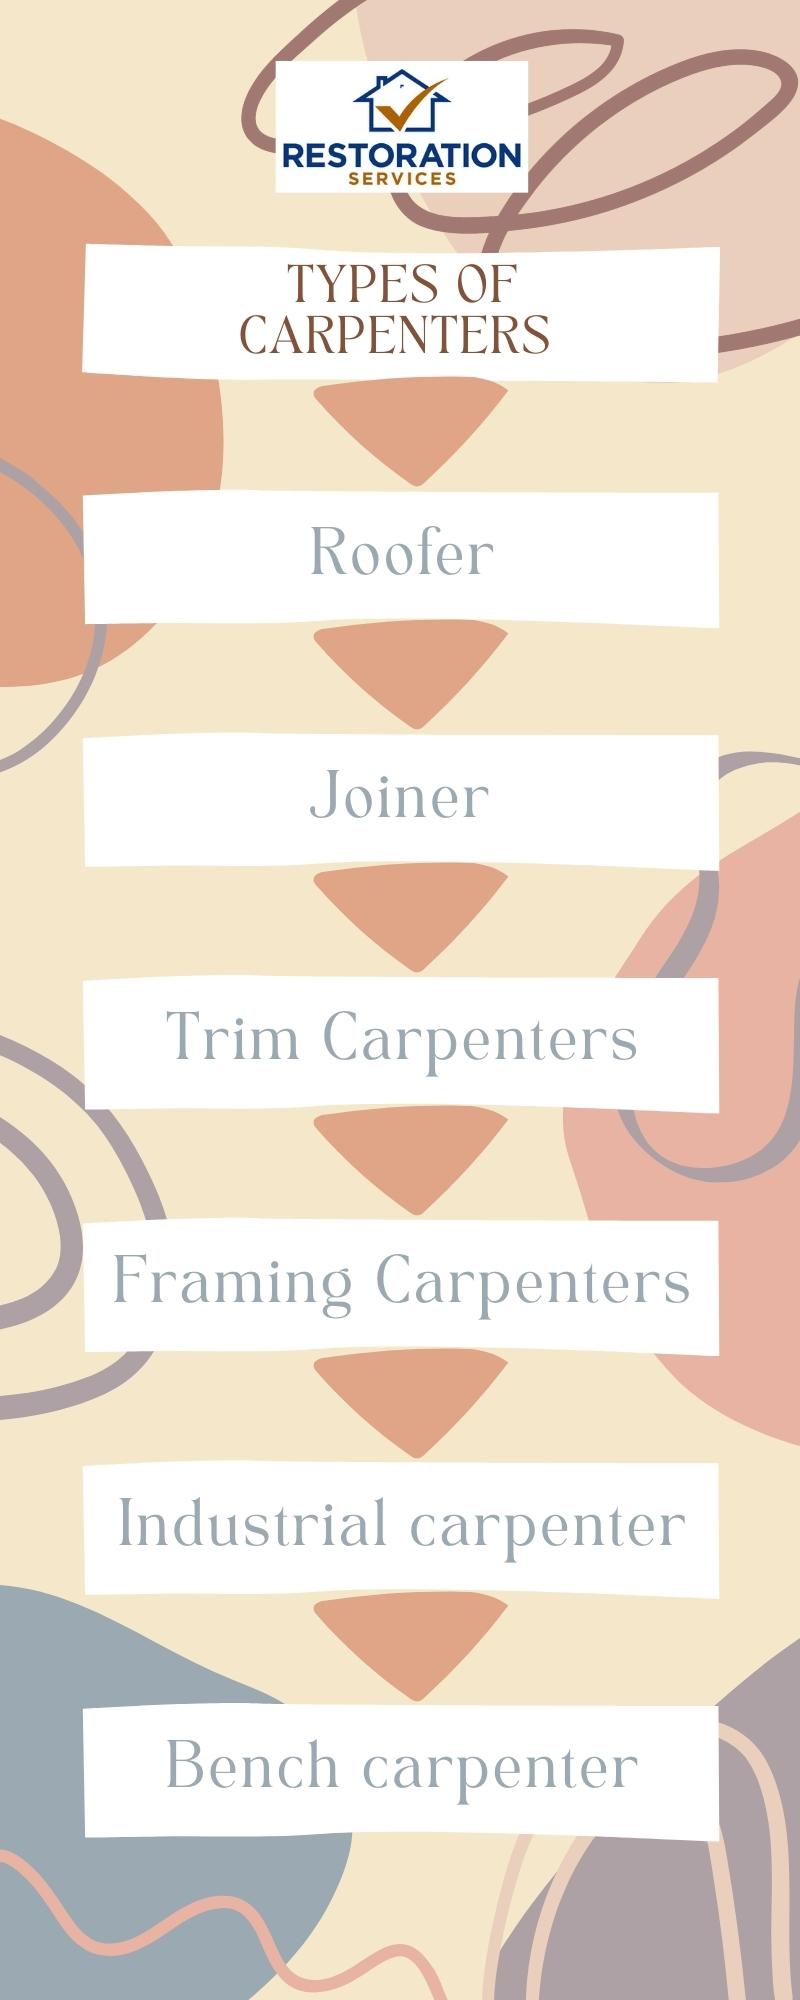 types of carpenters